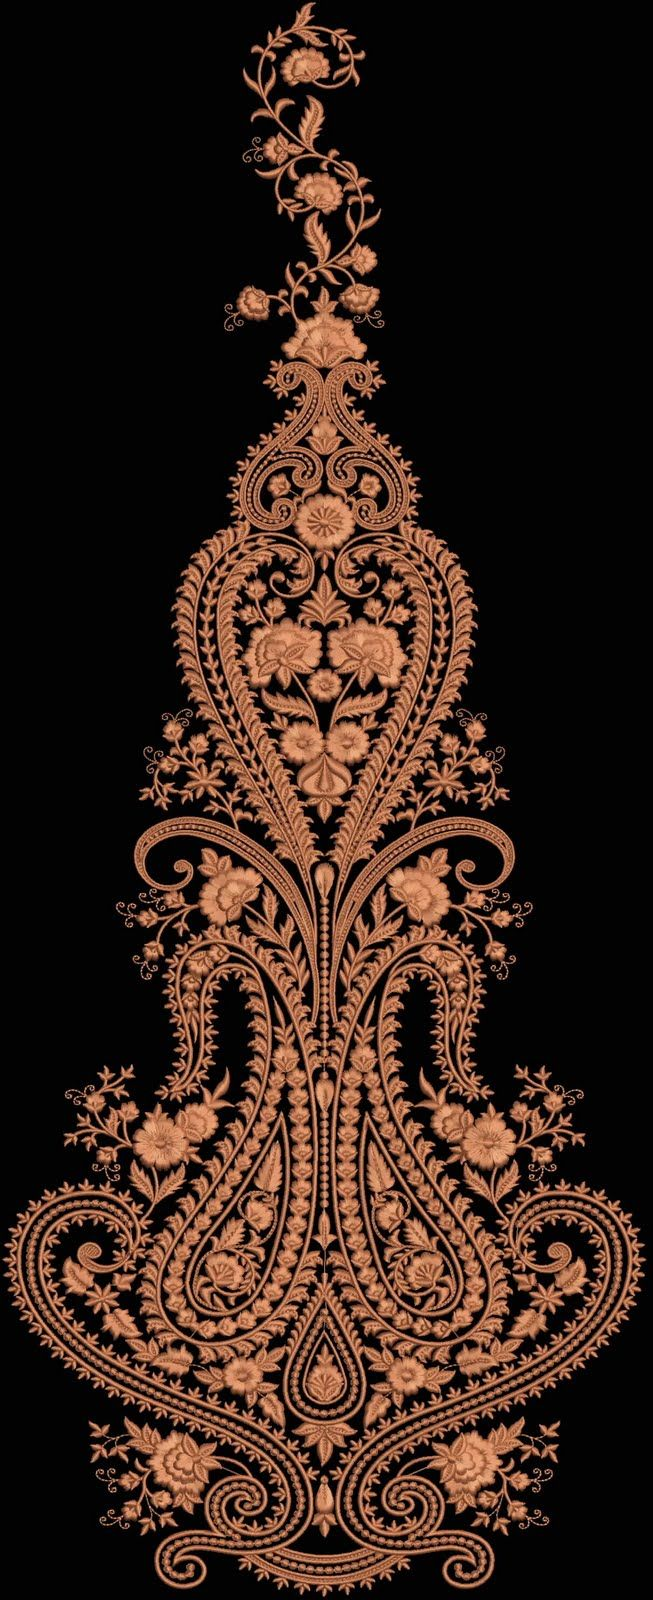 great pattern idea - Kurta Embroidery Designs products, buy Kurta Embroidery Designs